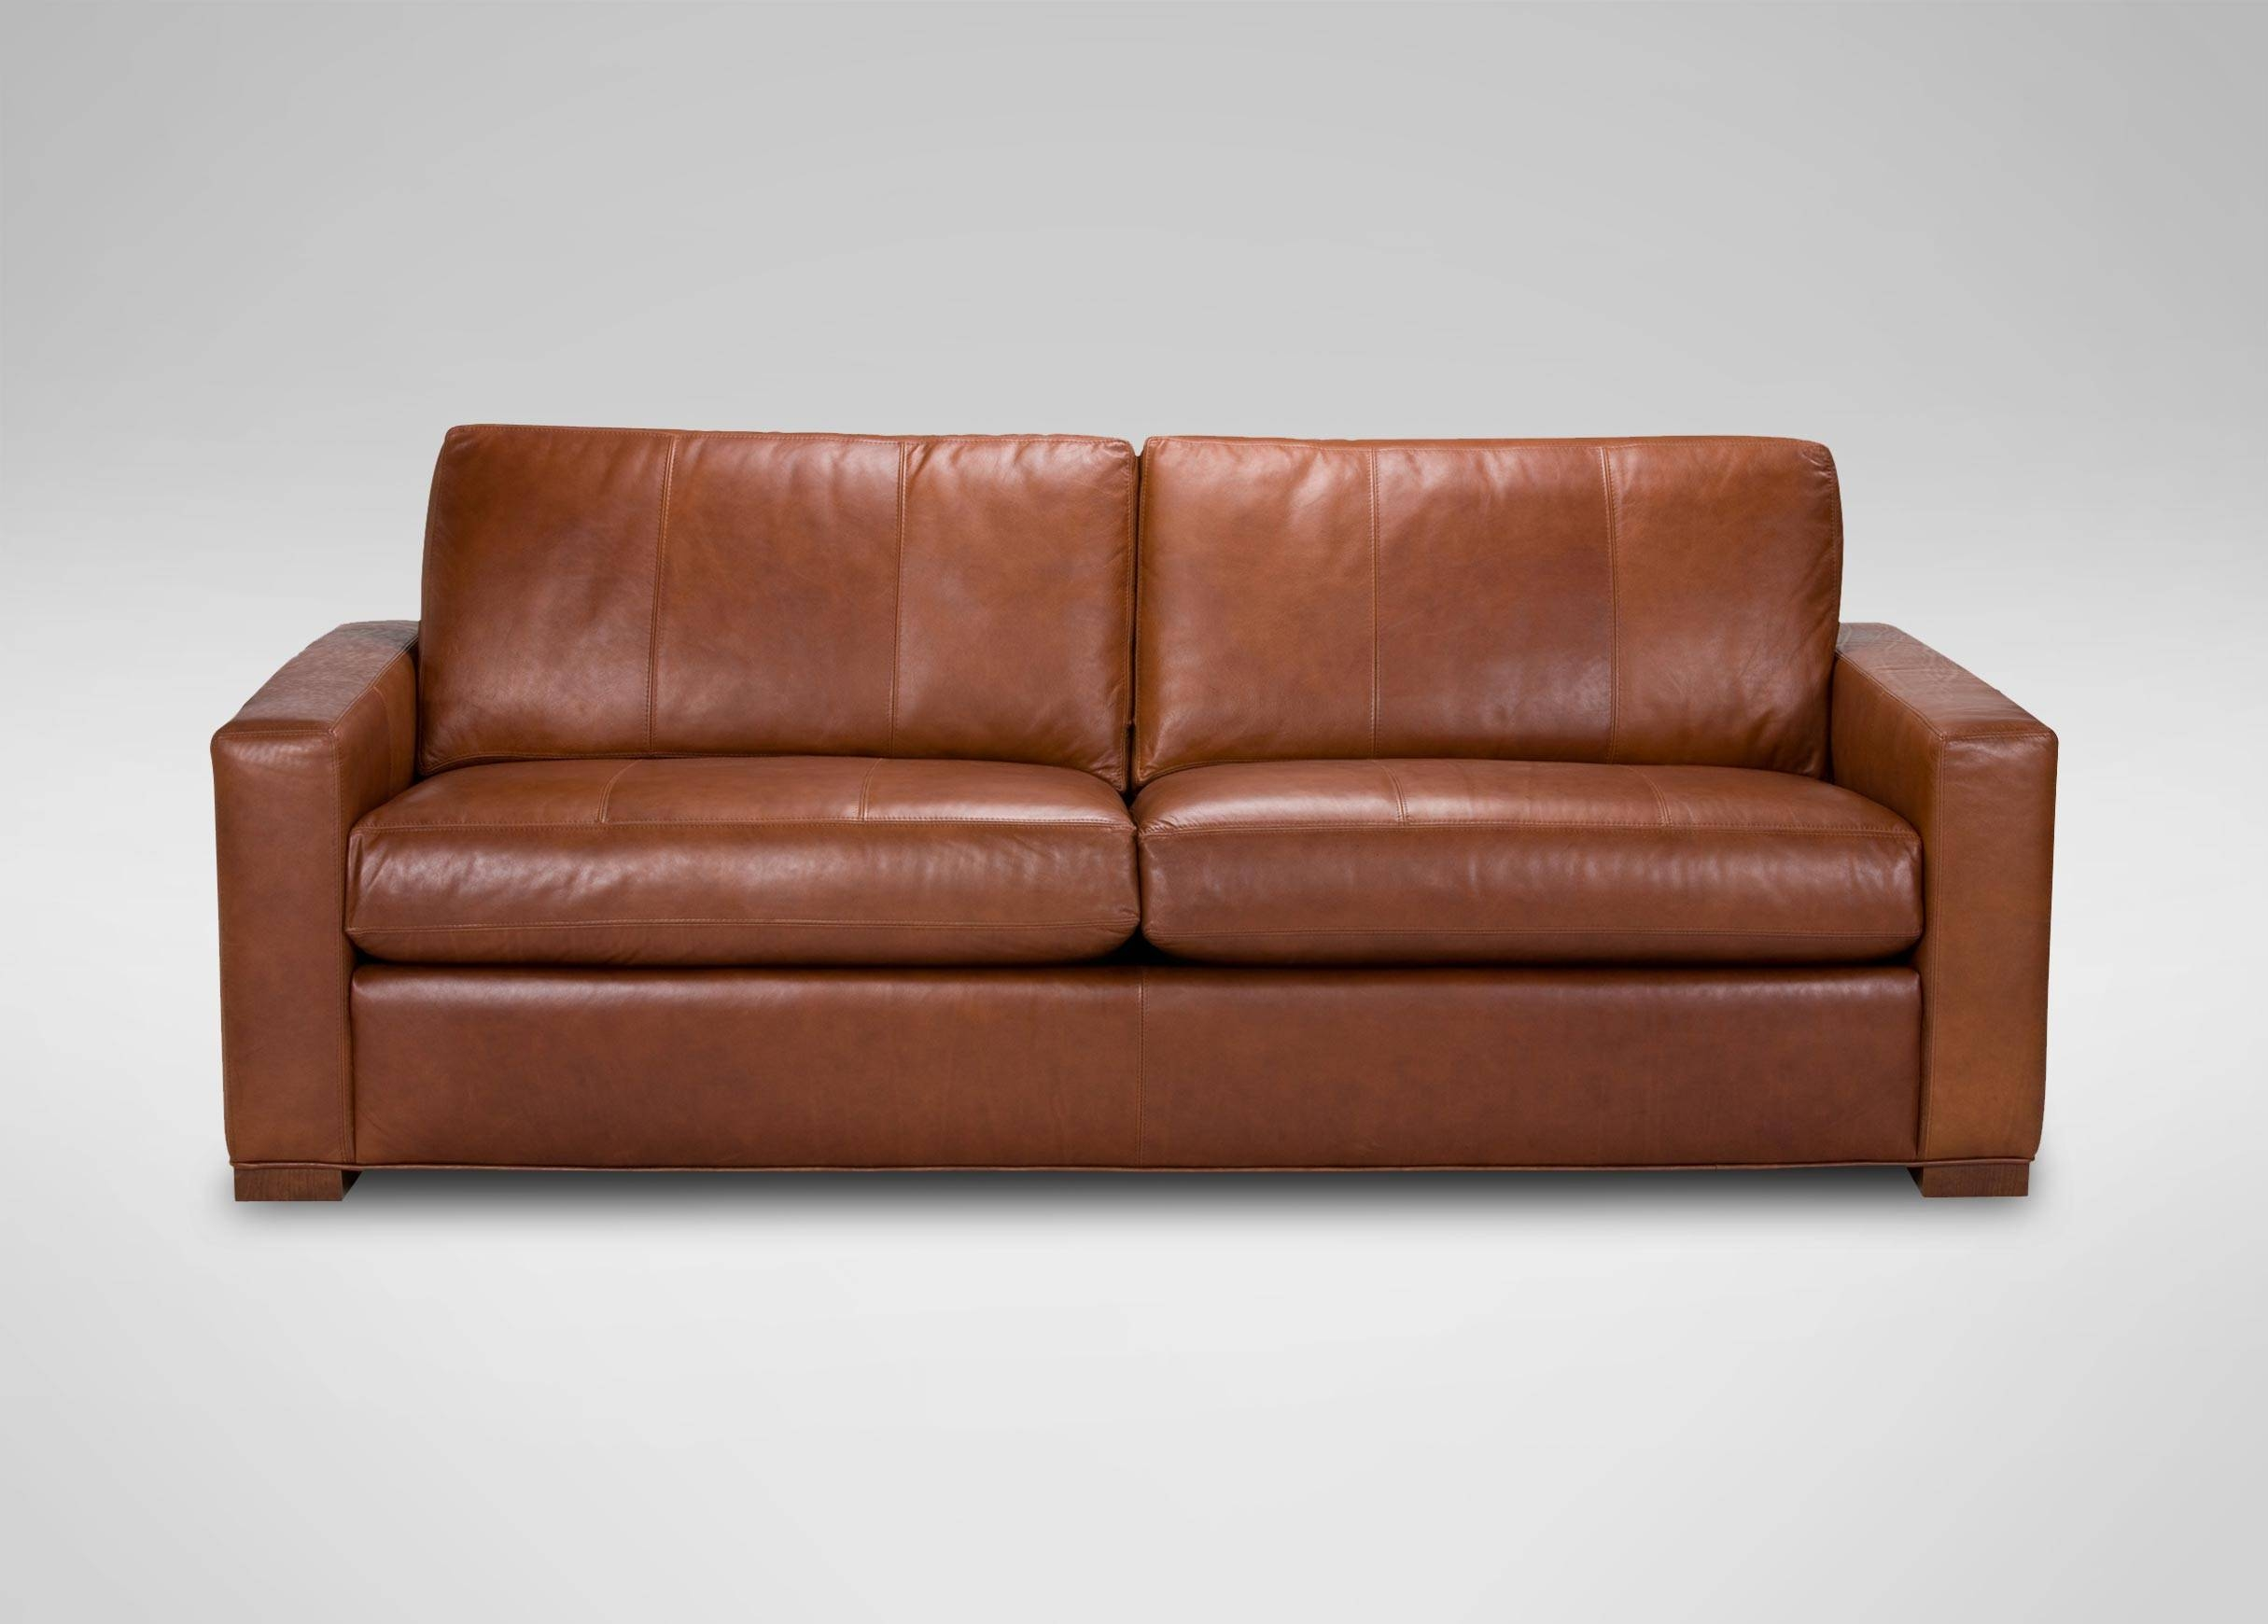 caramel colored leather sofas ligne roset sofa modell smala 2018 best of